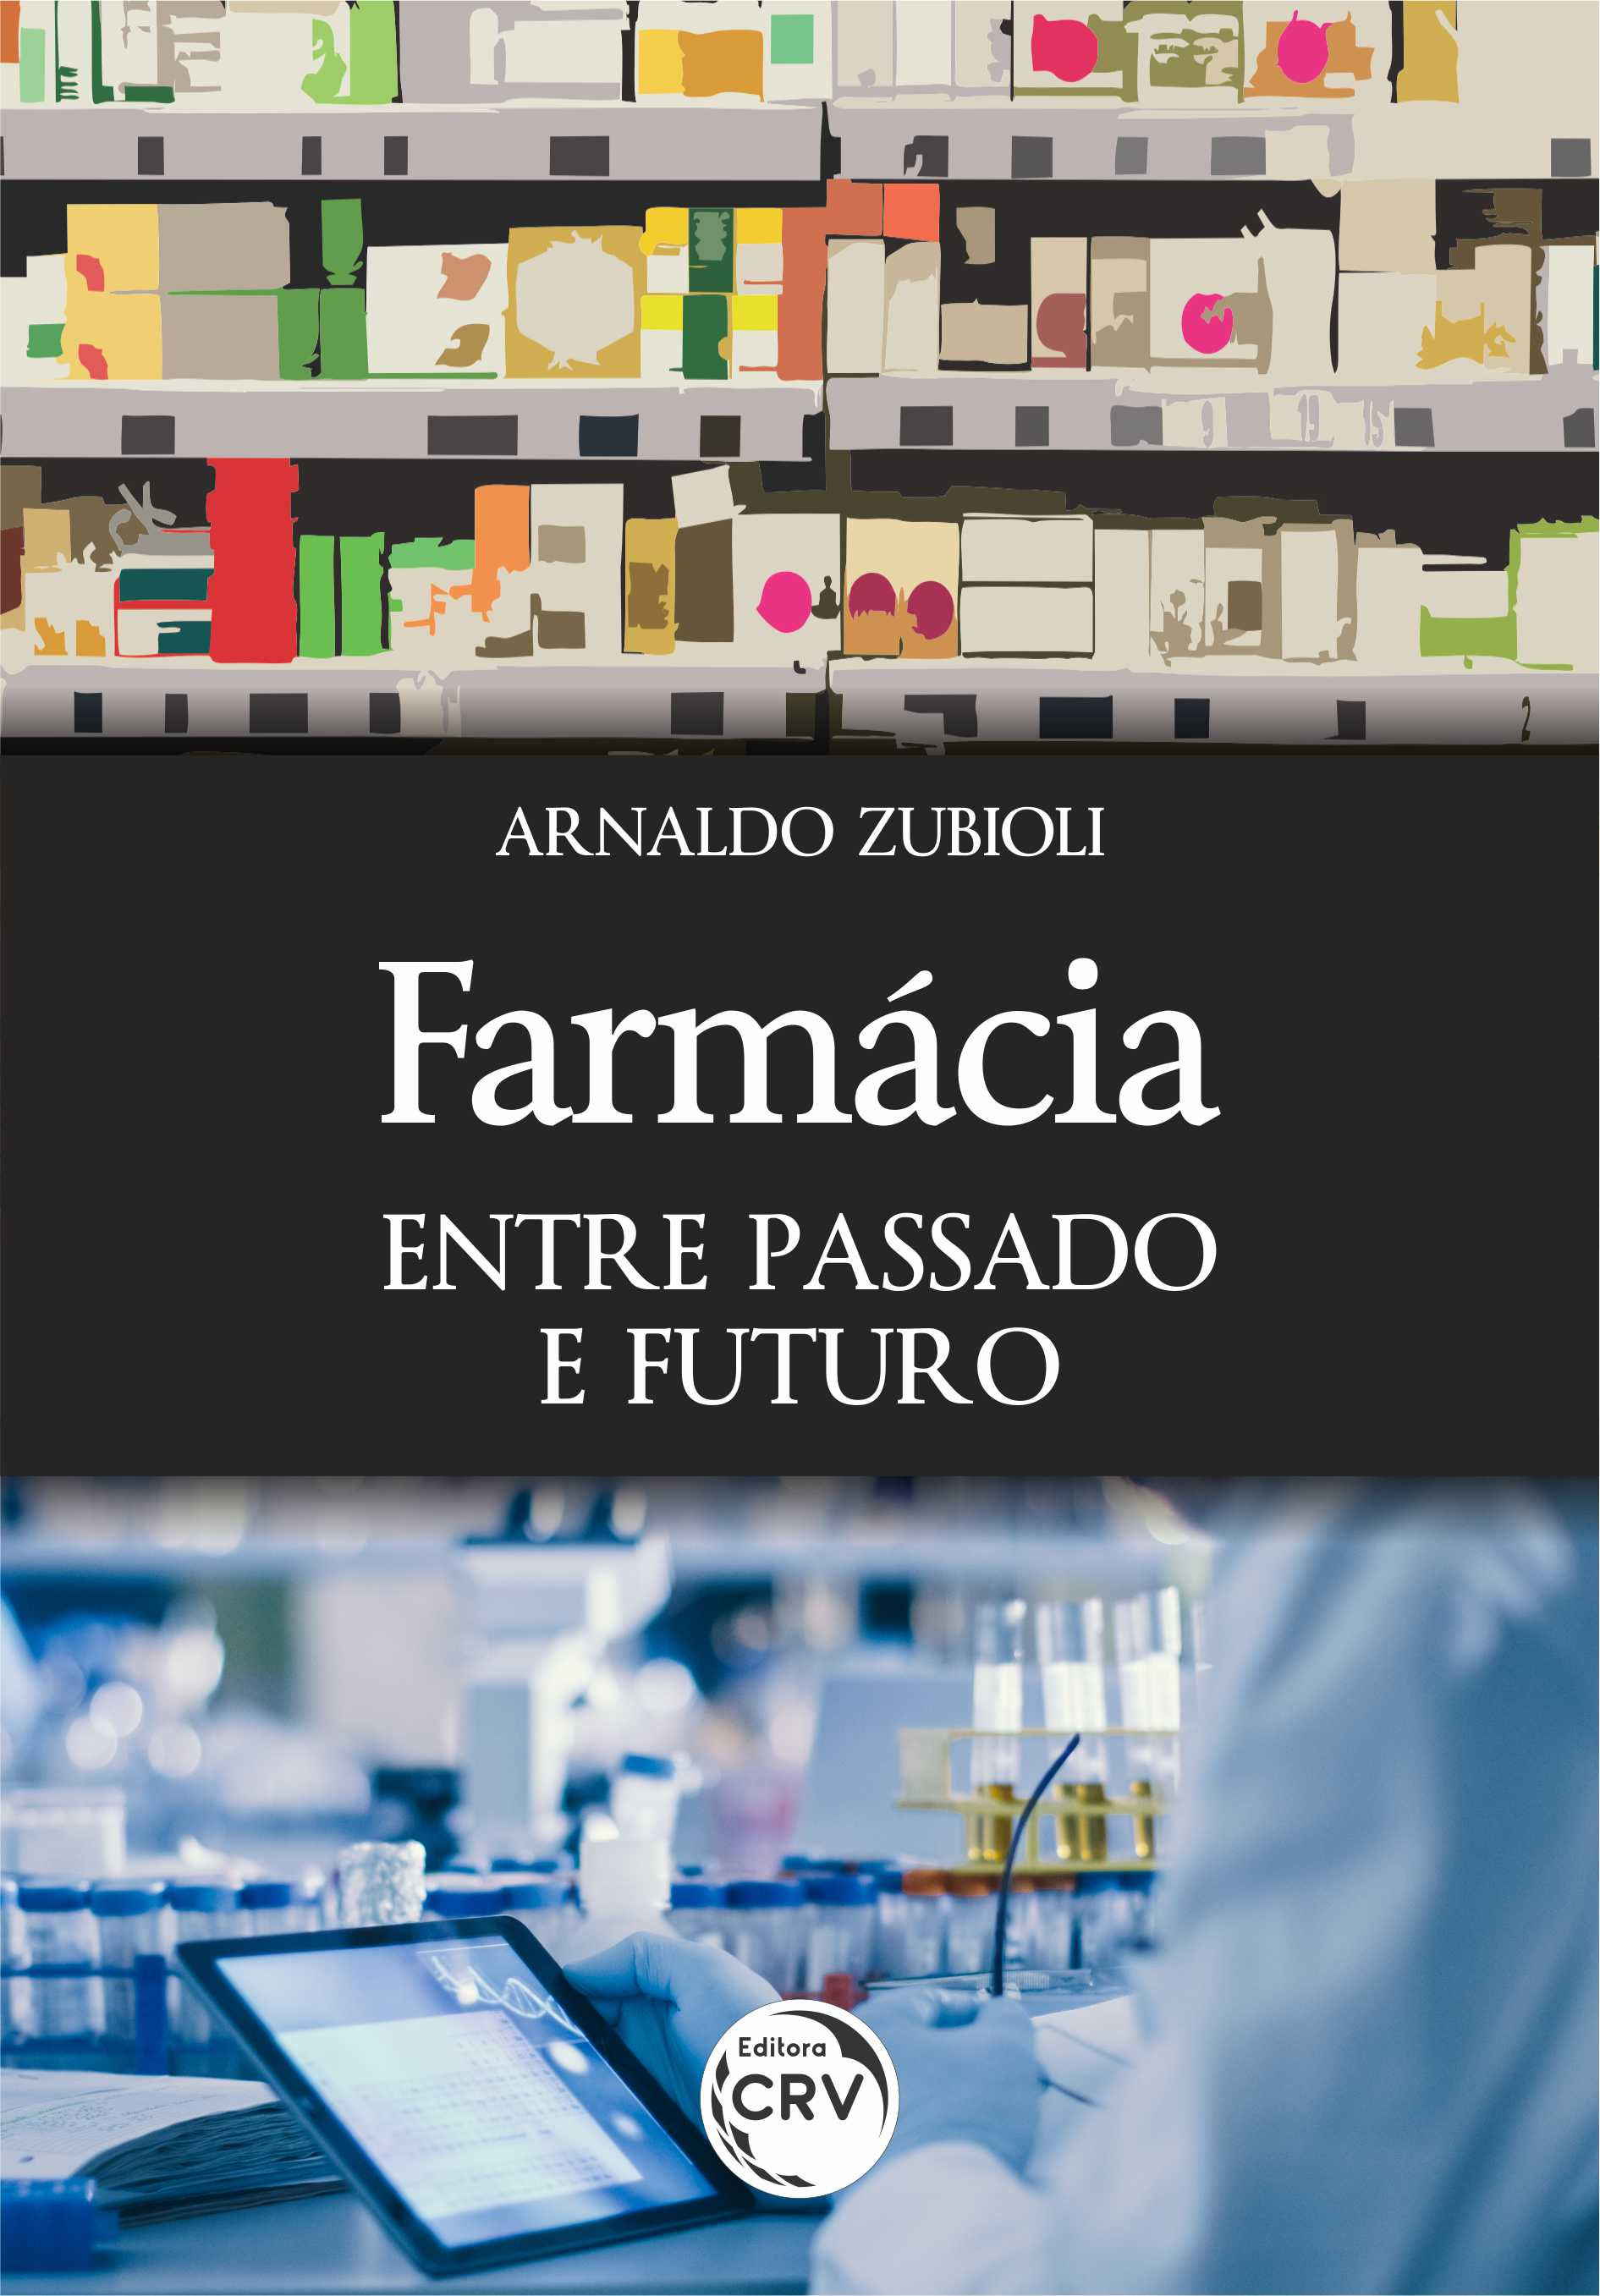 Capa do livro: FARMÁCIA: <br>entre passado e futuro